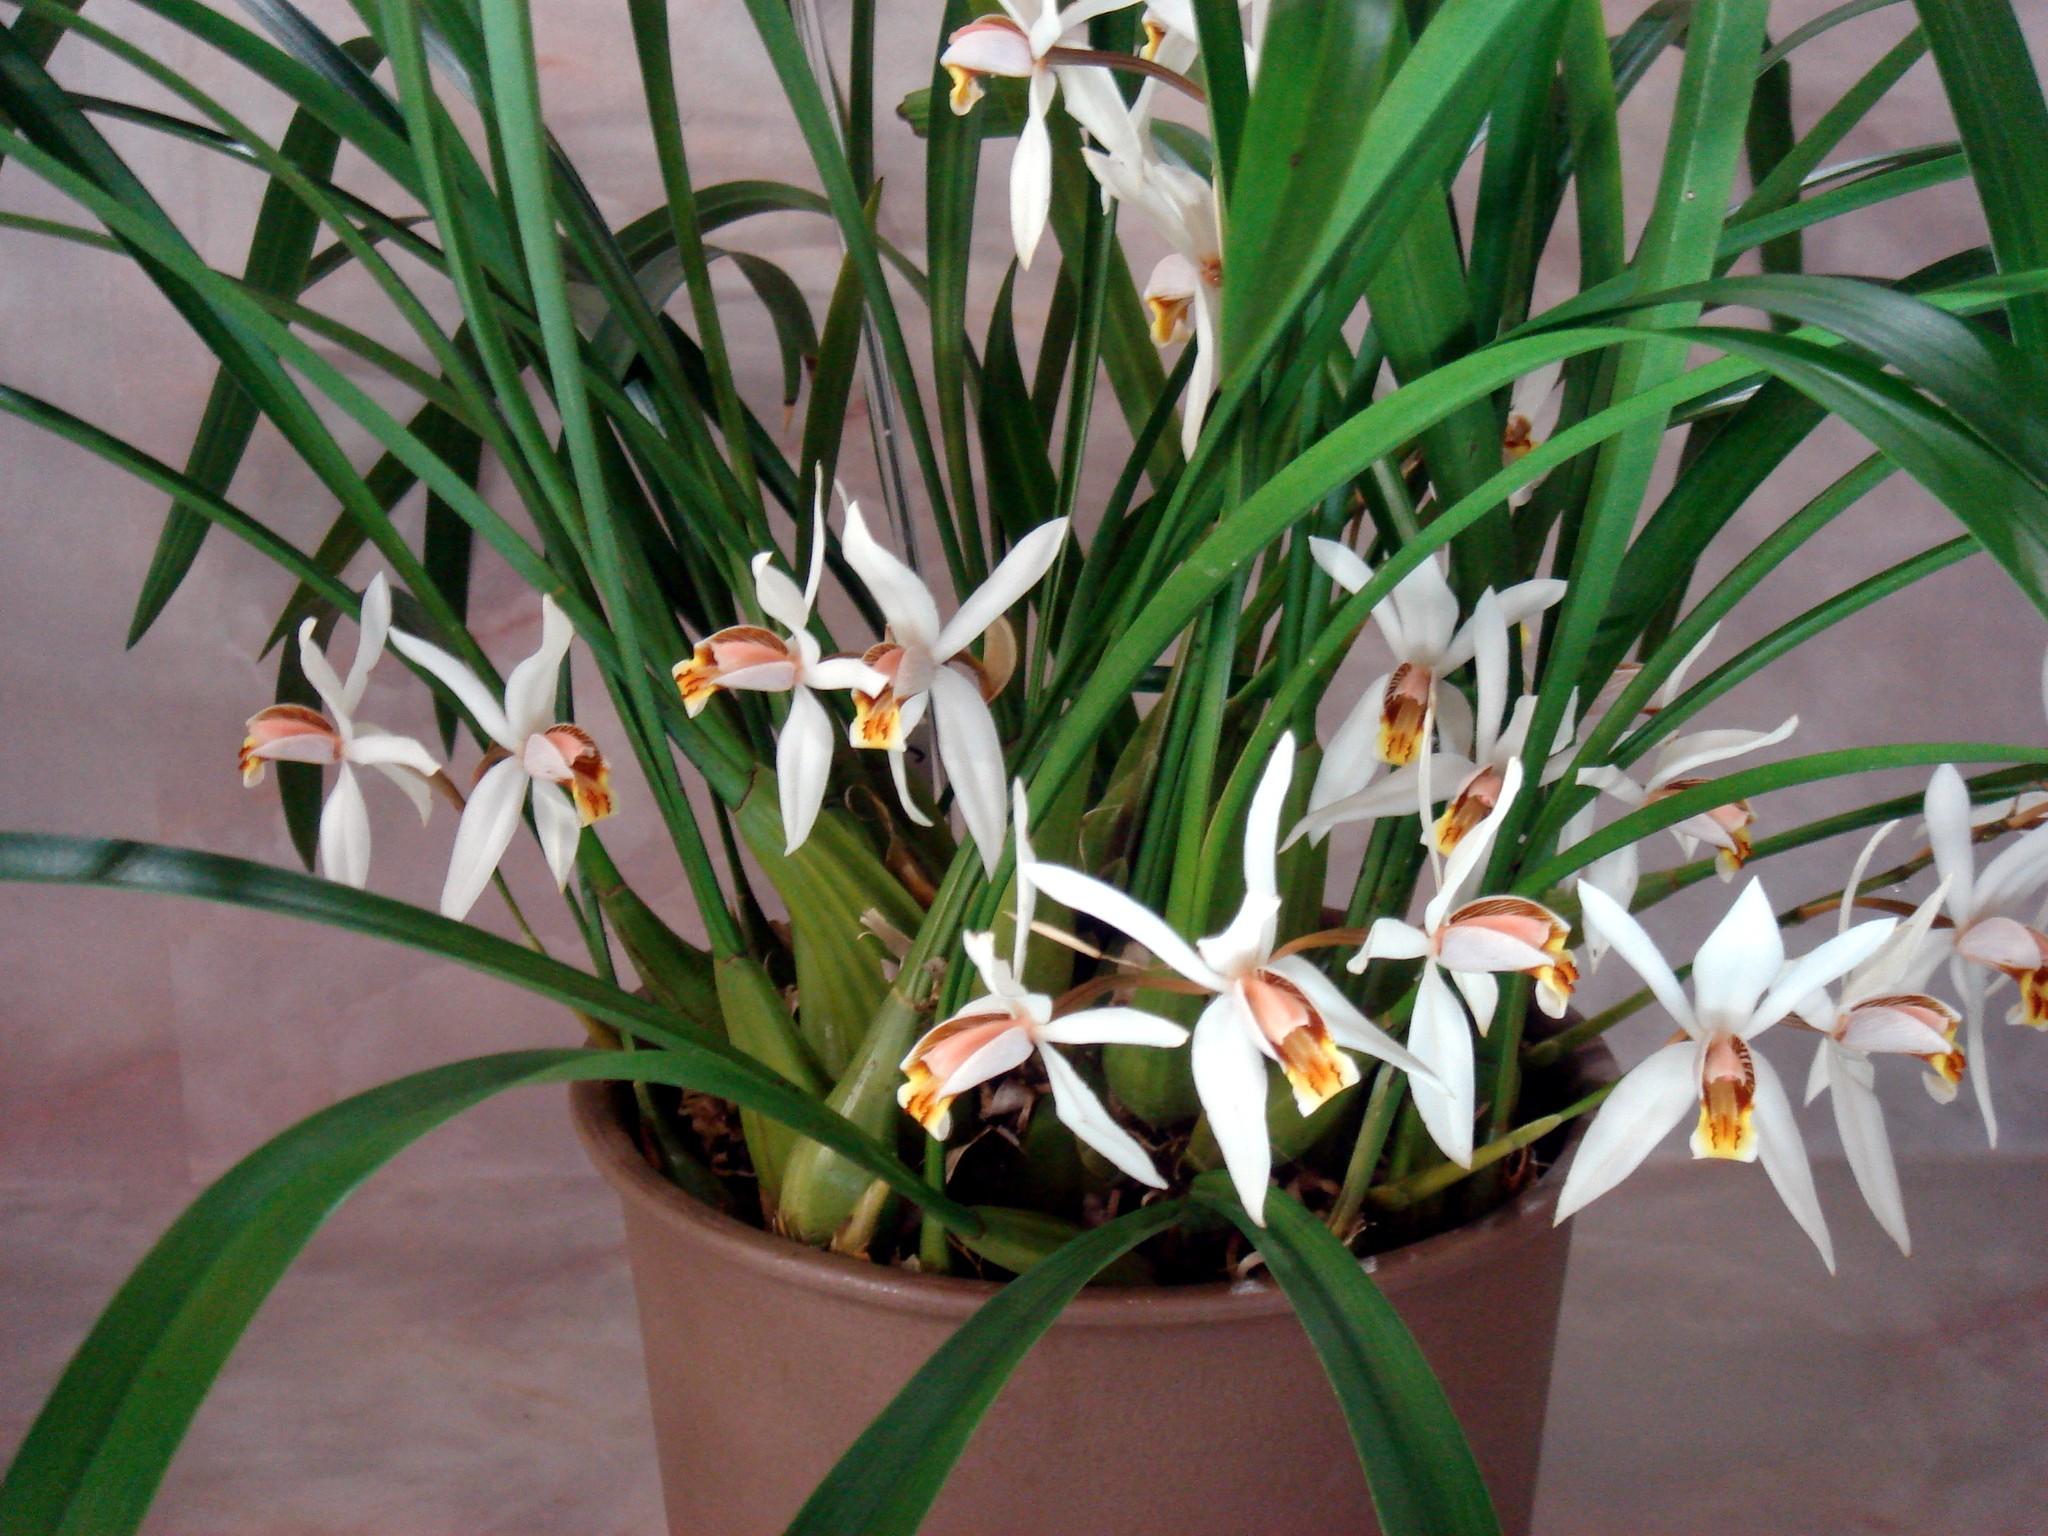 http://orchids.la.coocan.jp/Coelogyne/Coelogyne%20viscosa/DSC01679.JPG